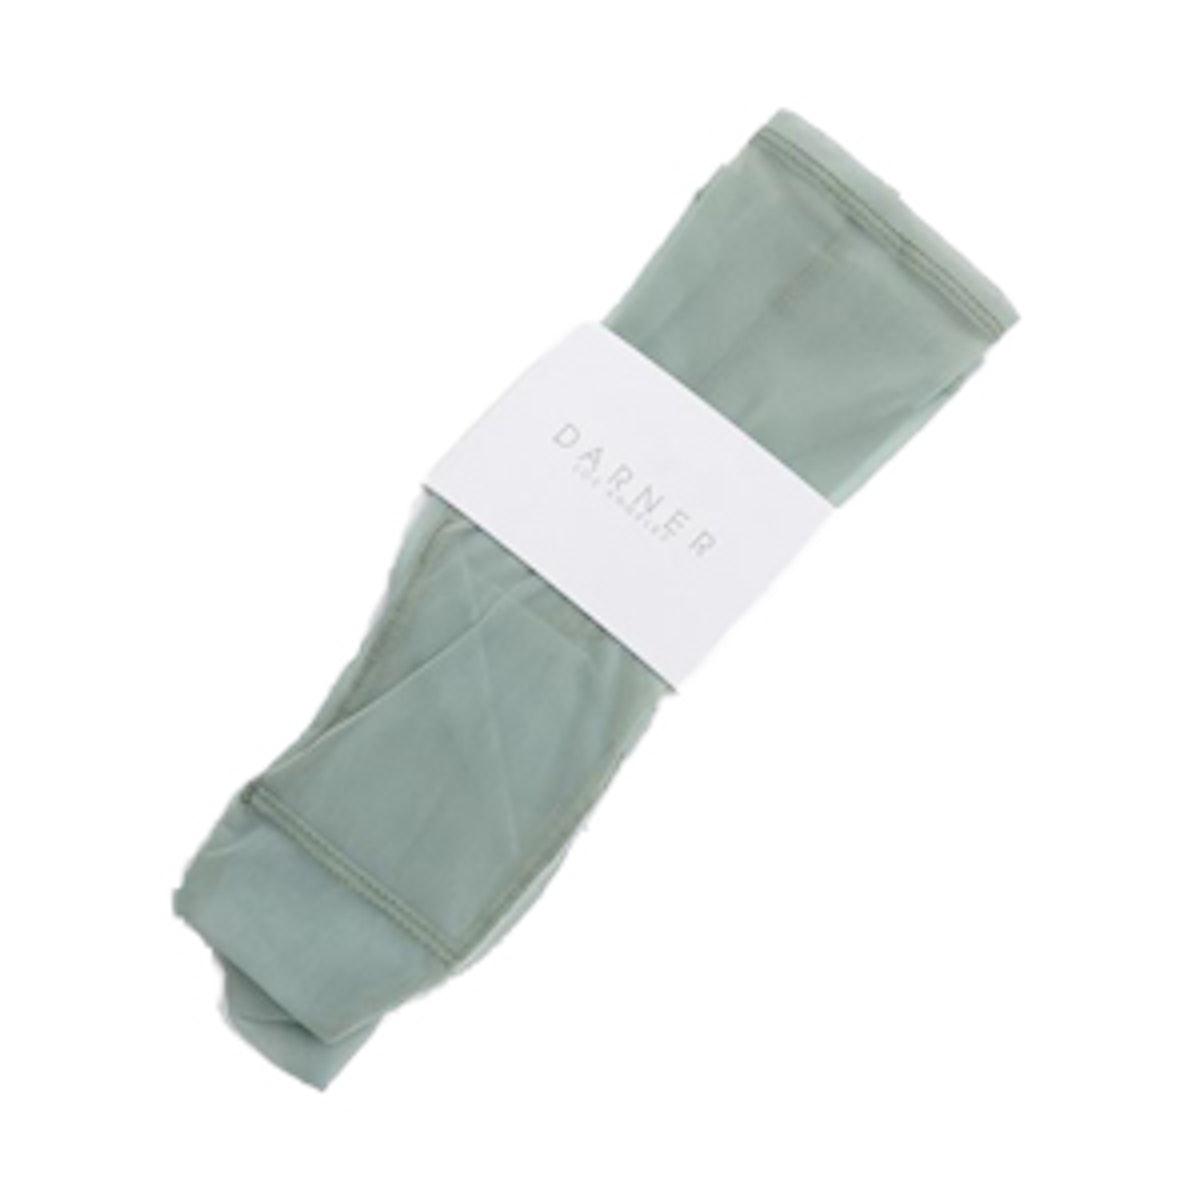 Mesh Socks in Mint